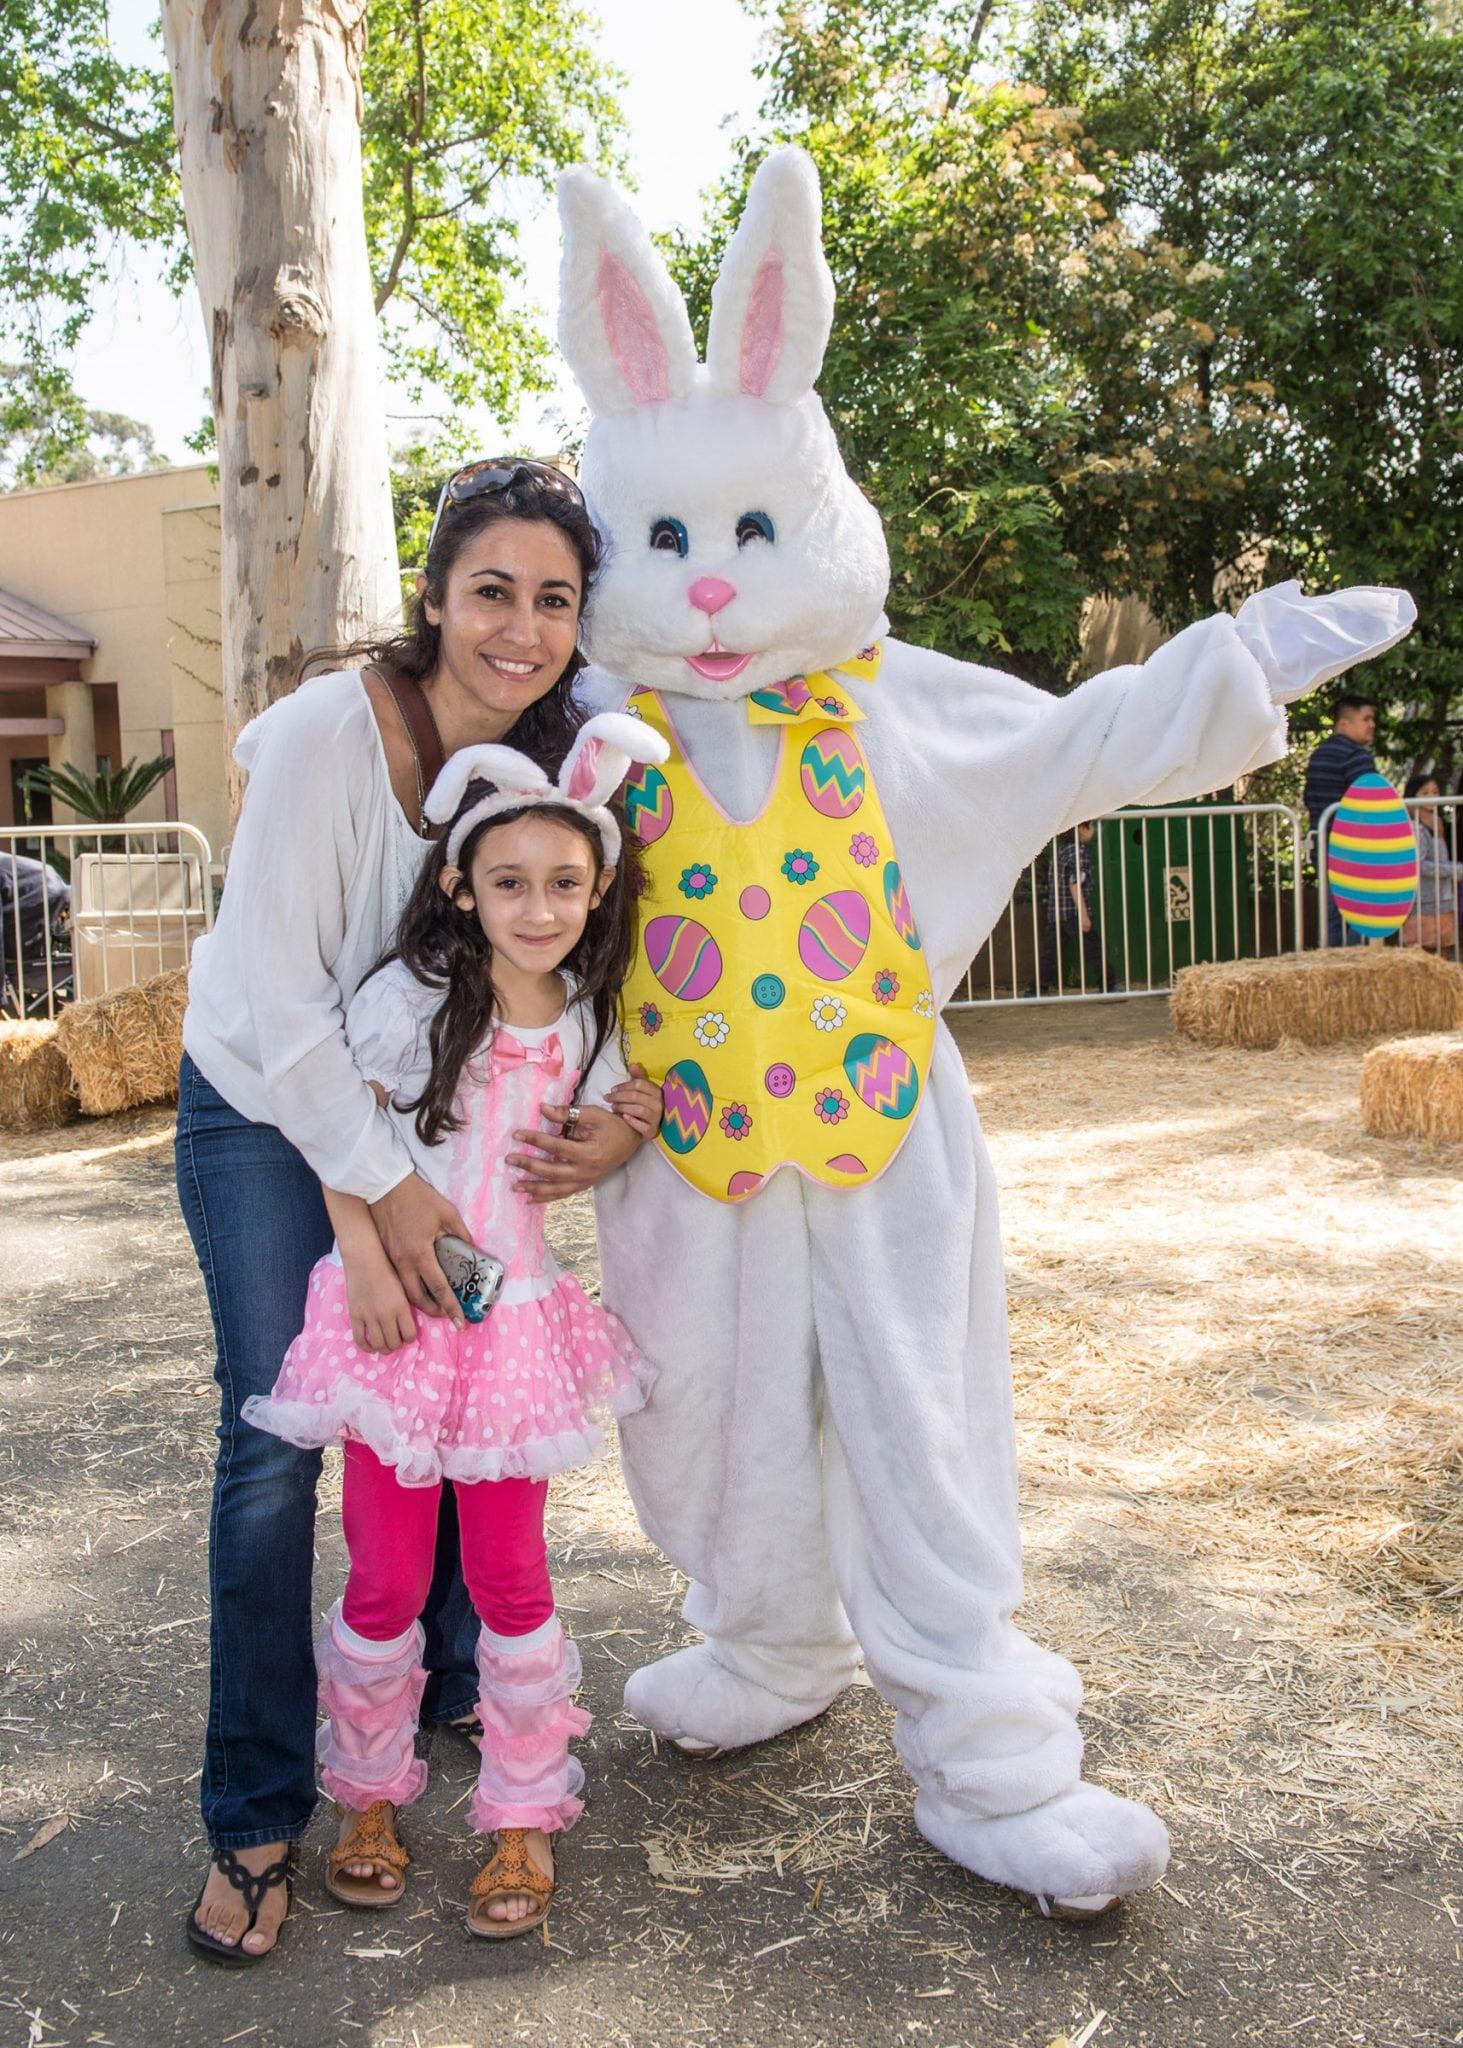 Big Bunny Spring Fling at the Los Angeles Zoo